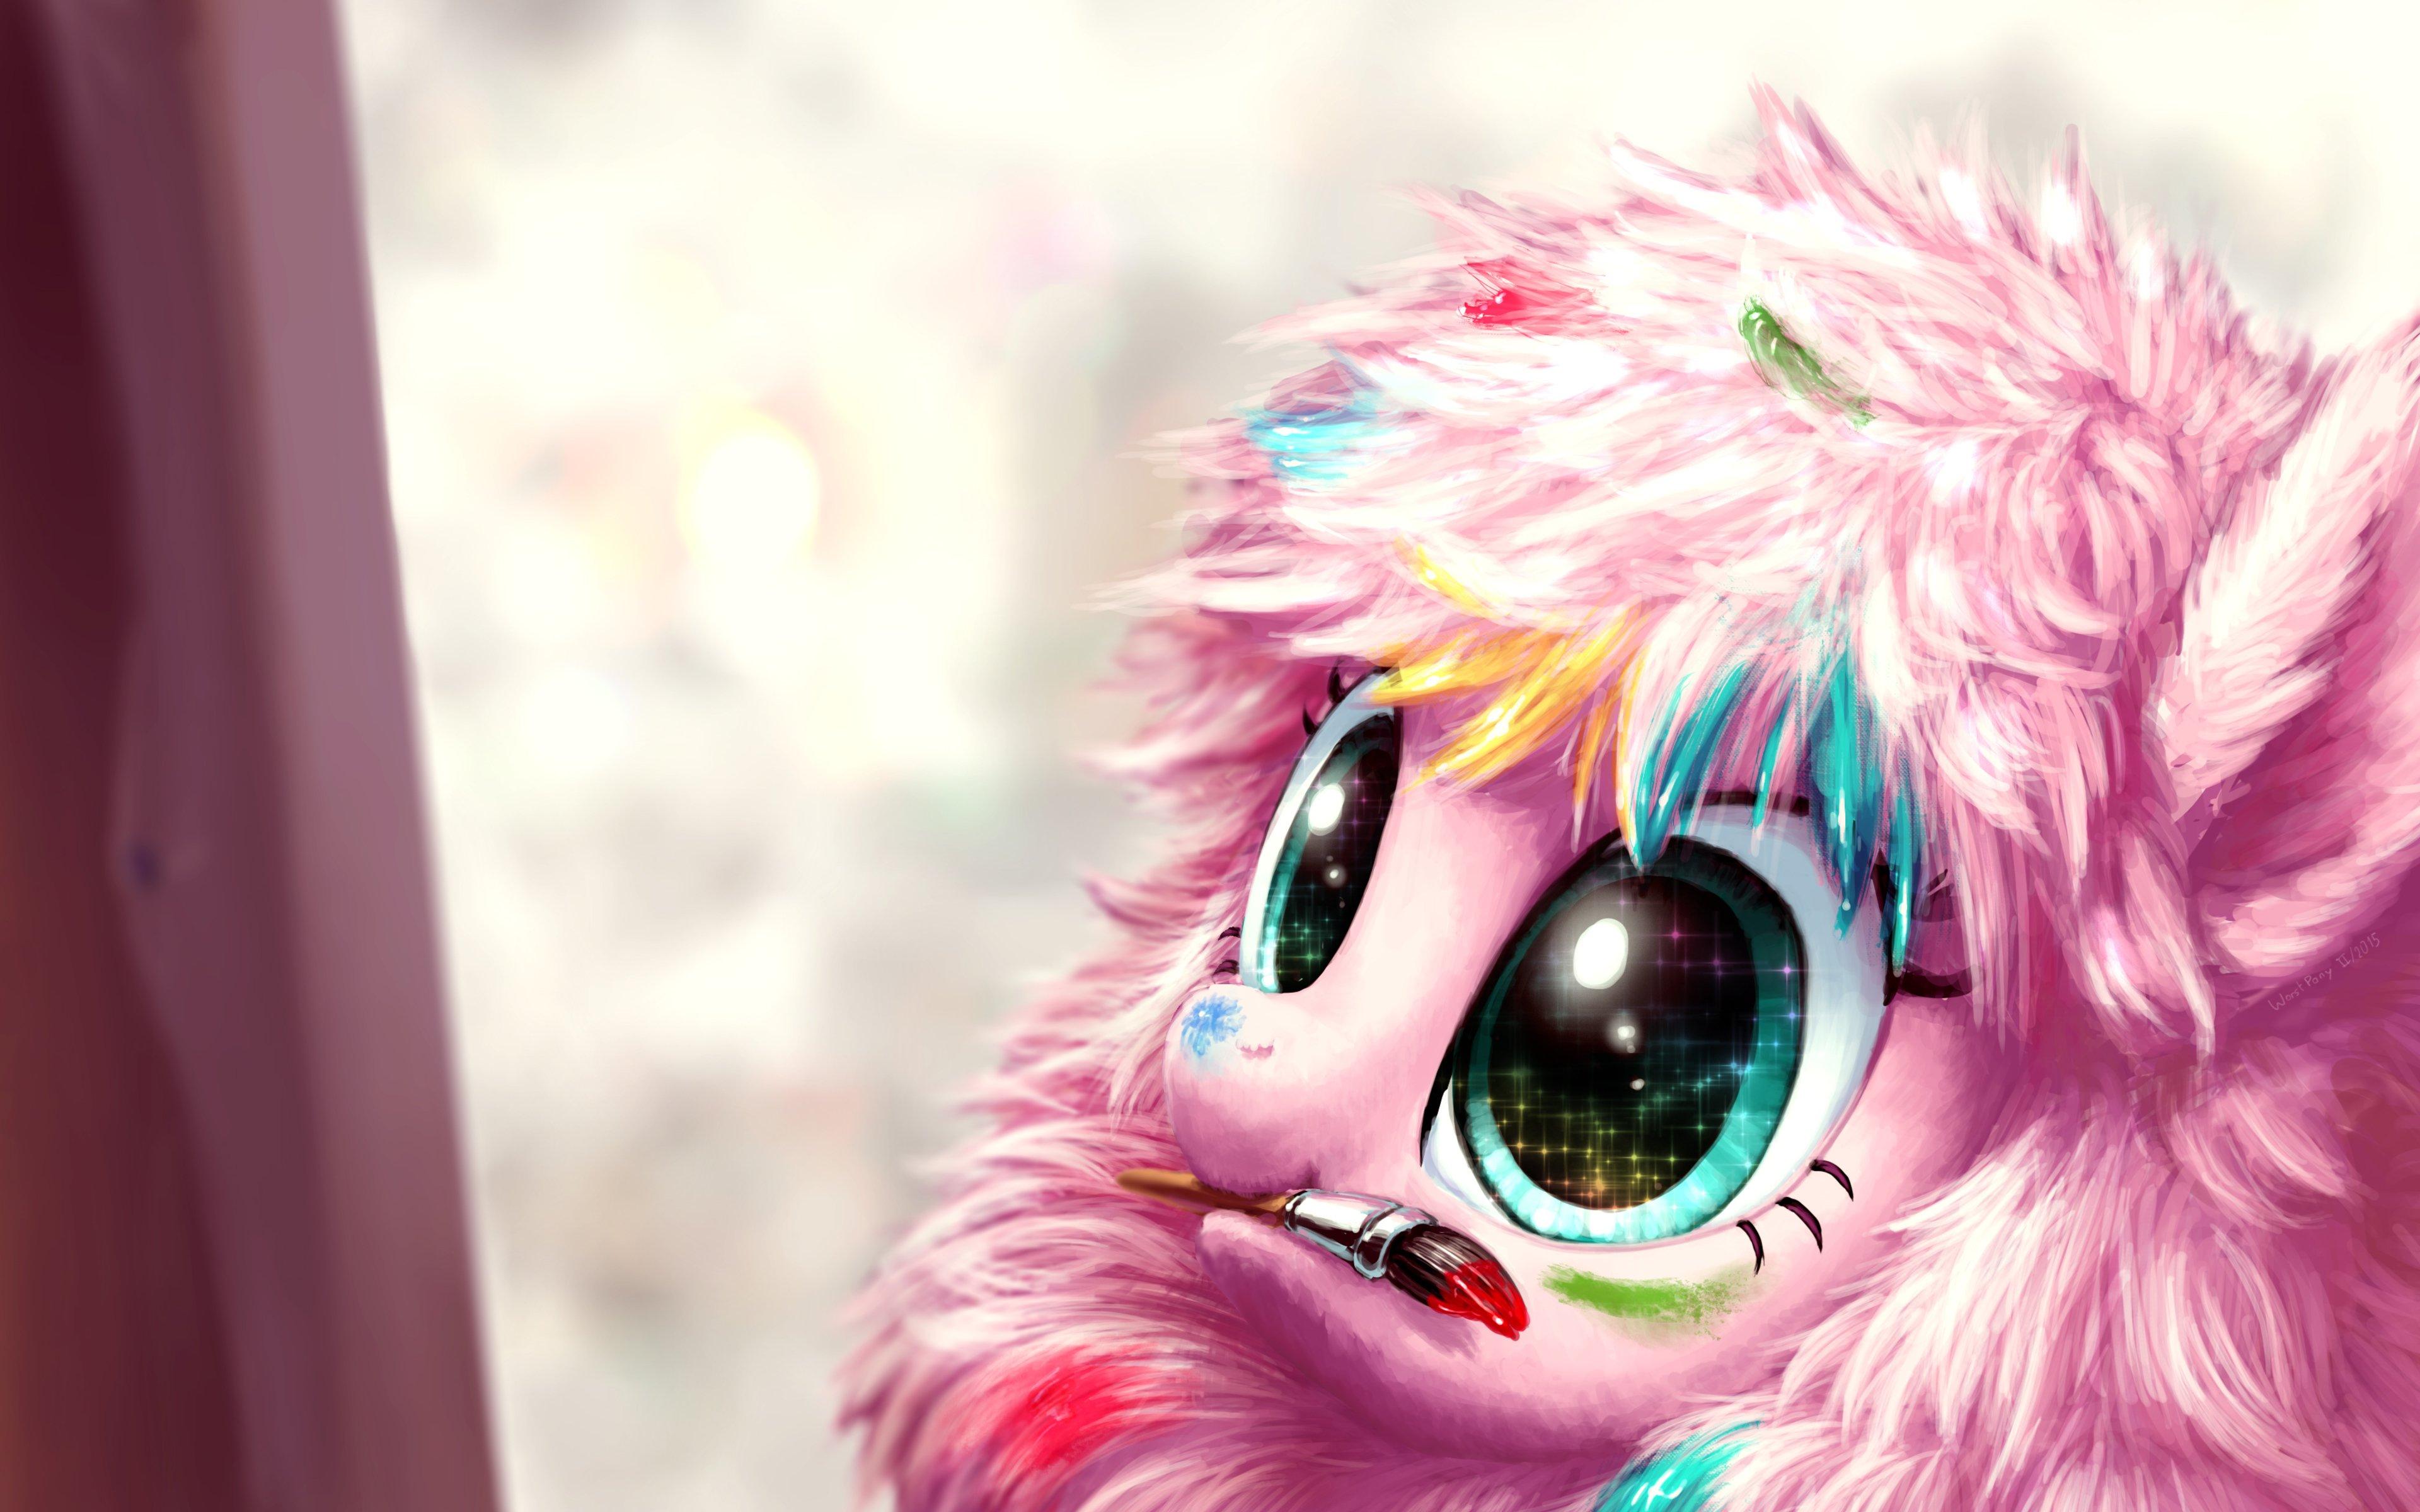 Fondos de pantalla Fluffle puff de Mi pequeño pony pintando